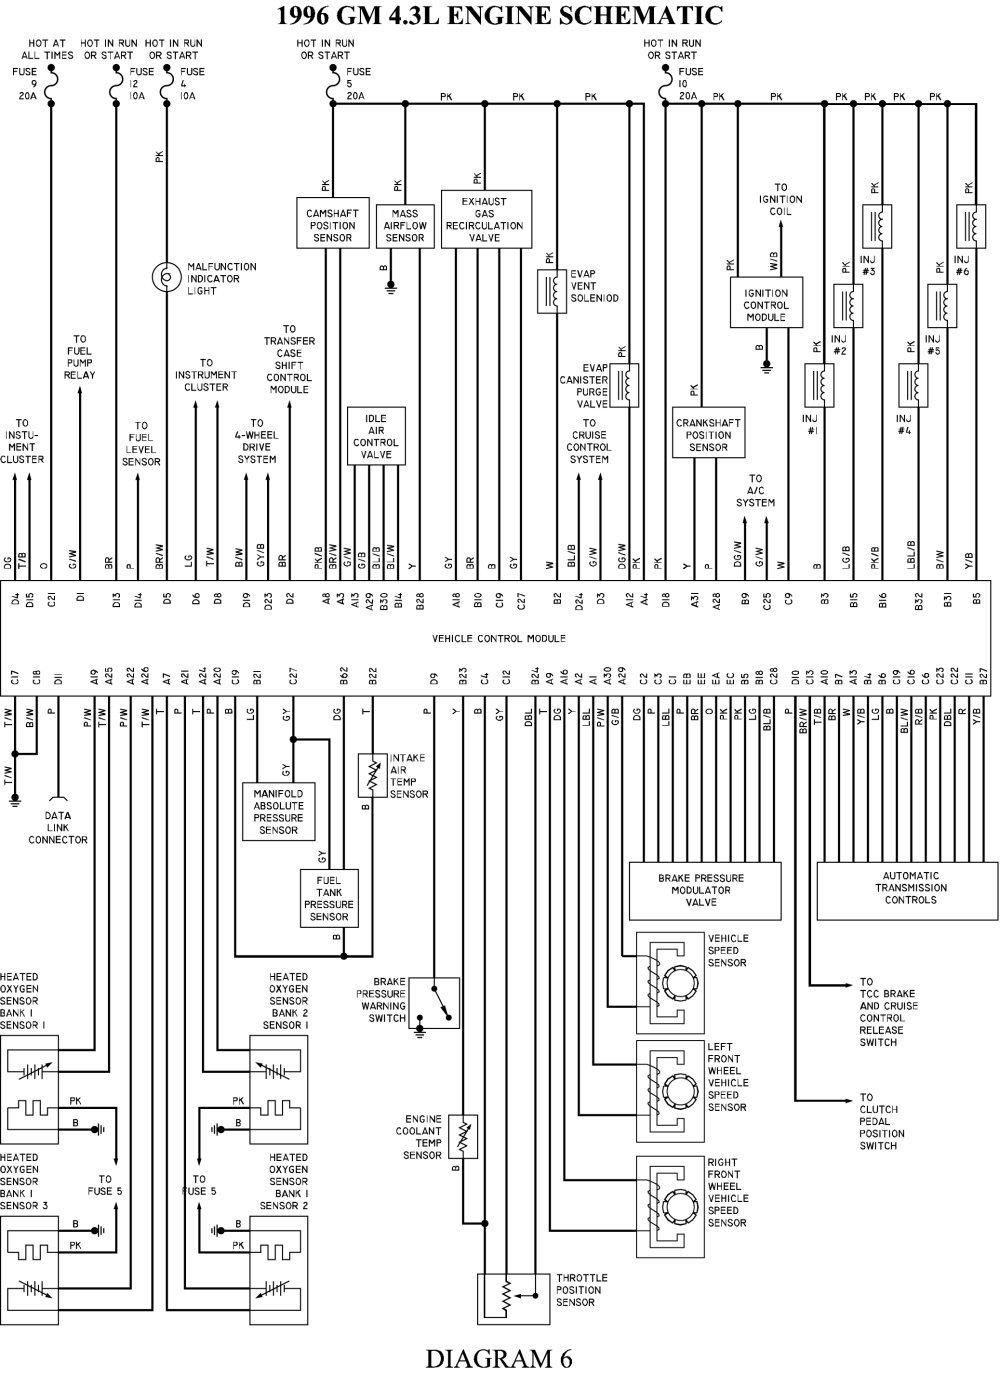 Diagram Http Wwwjustanswercom Gm 32bqcsecondaryairinjection